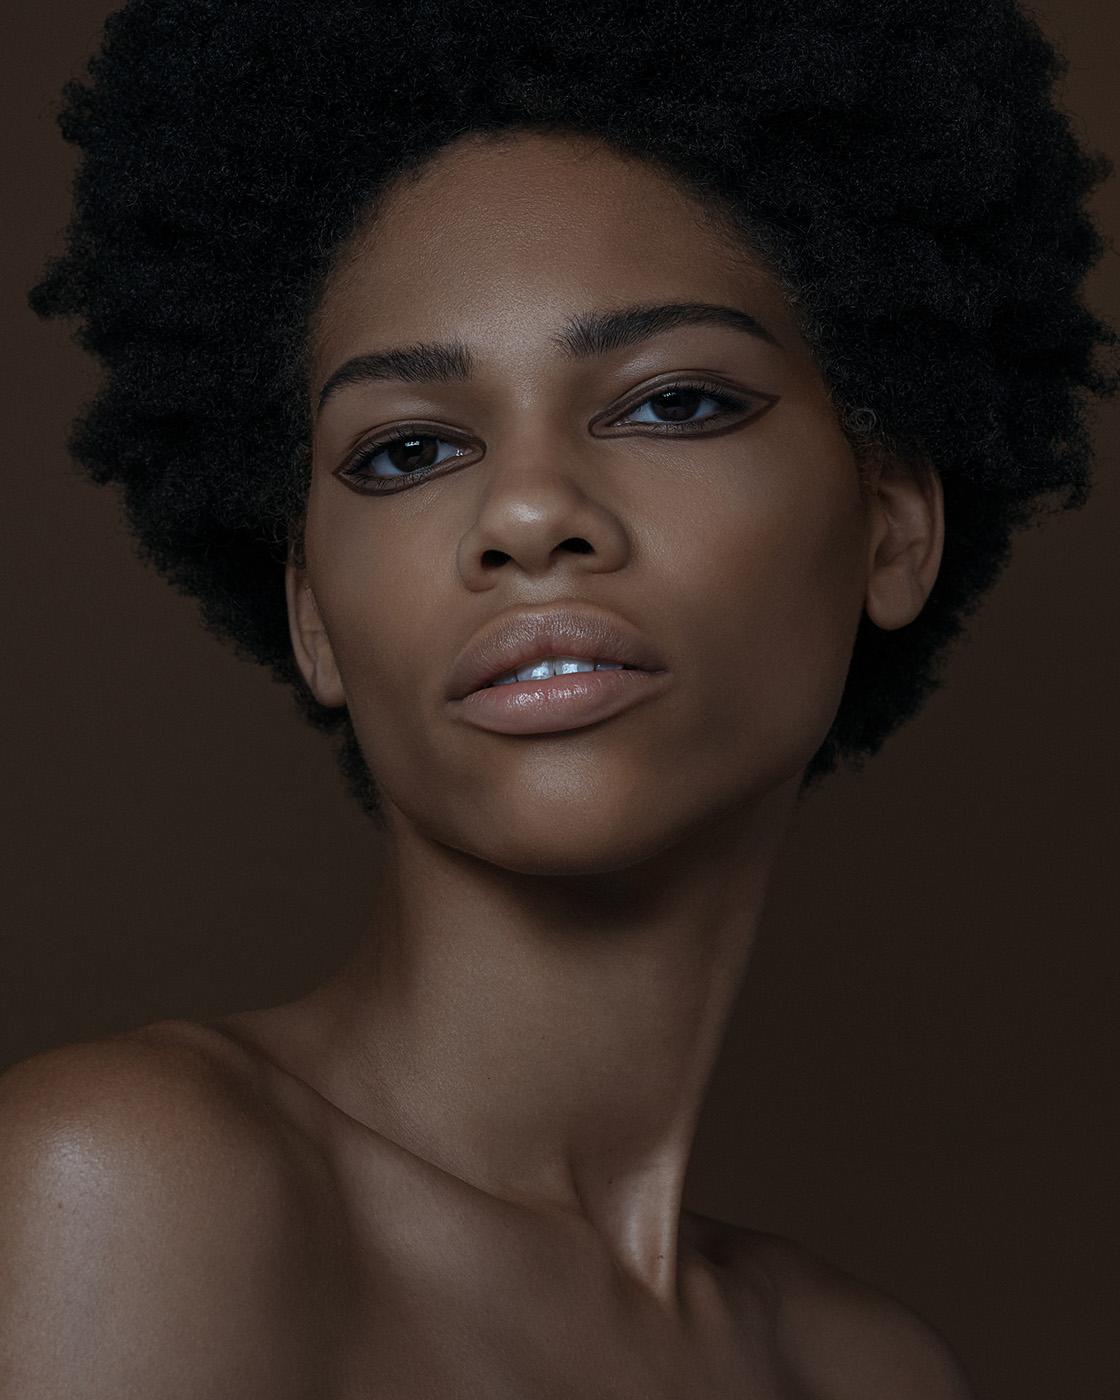 Beautyarchive